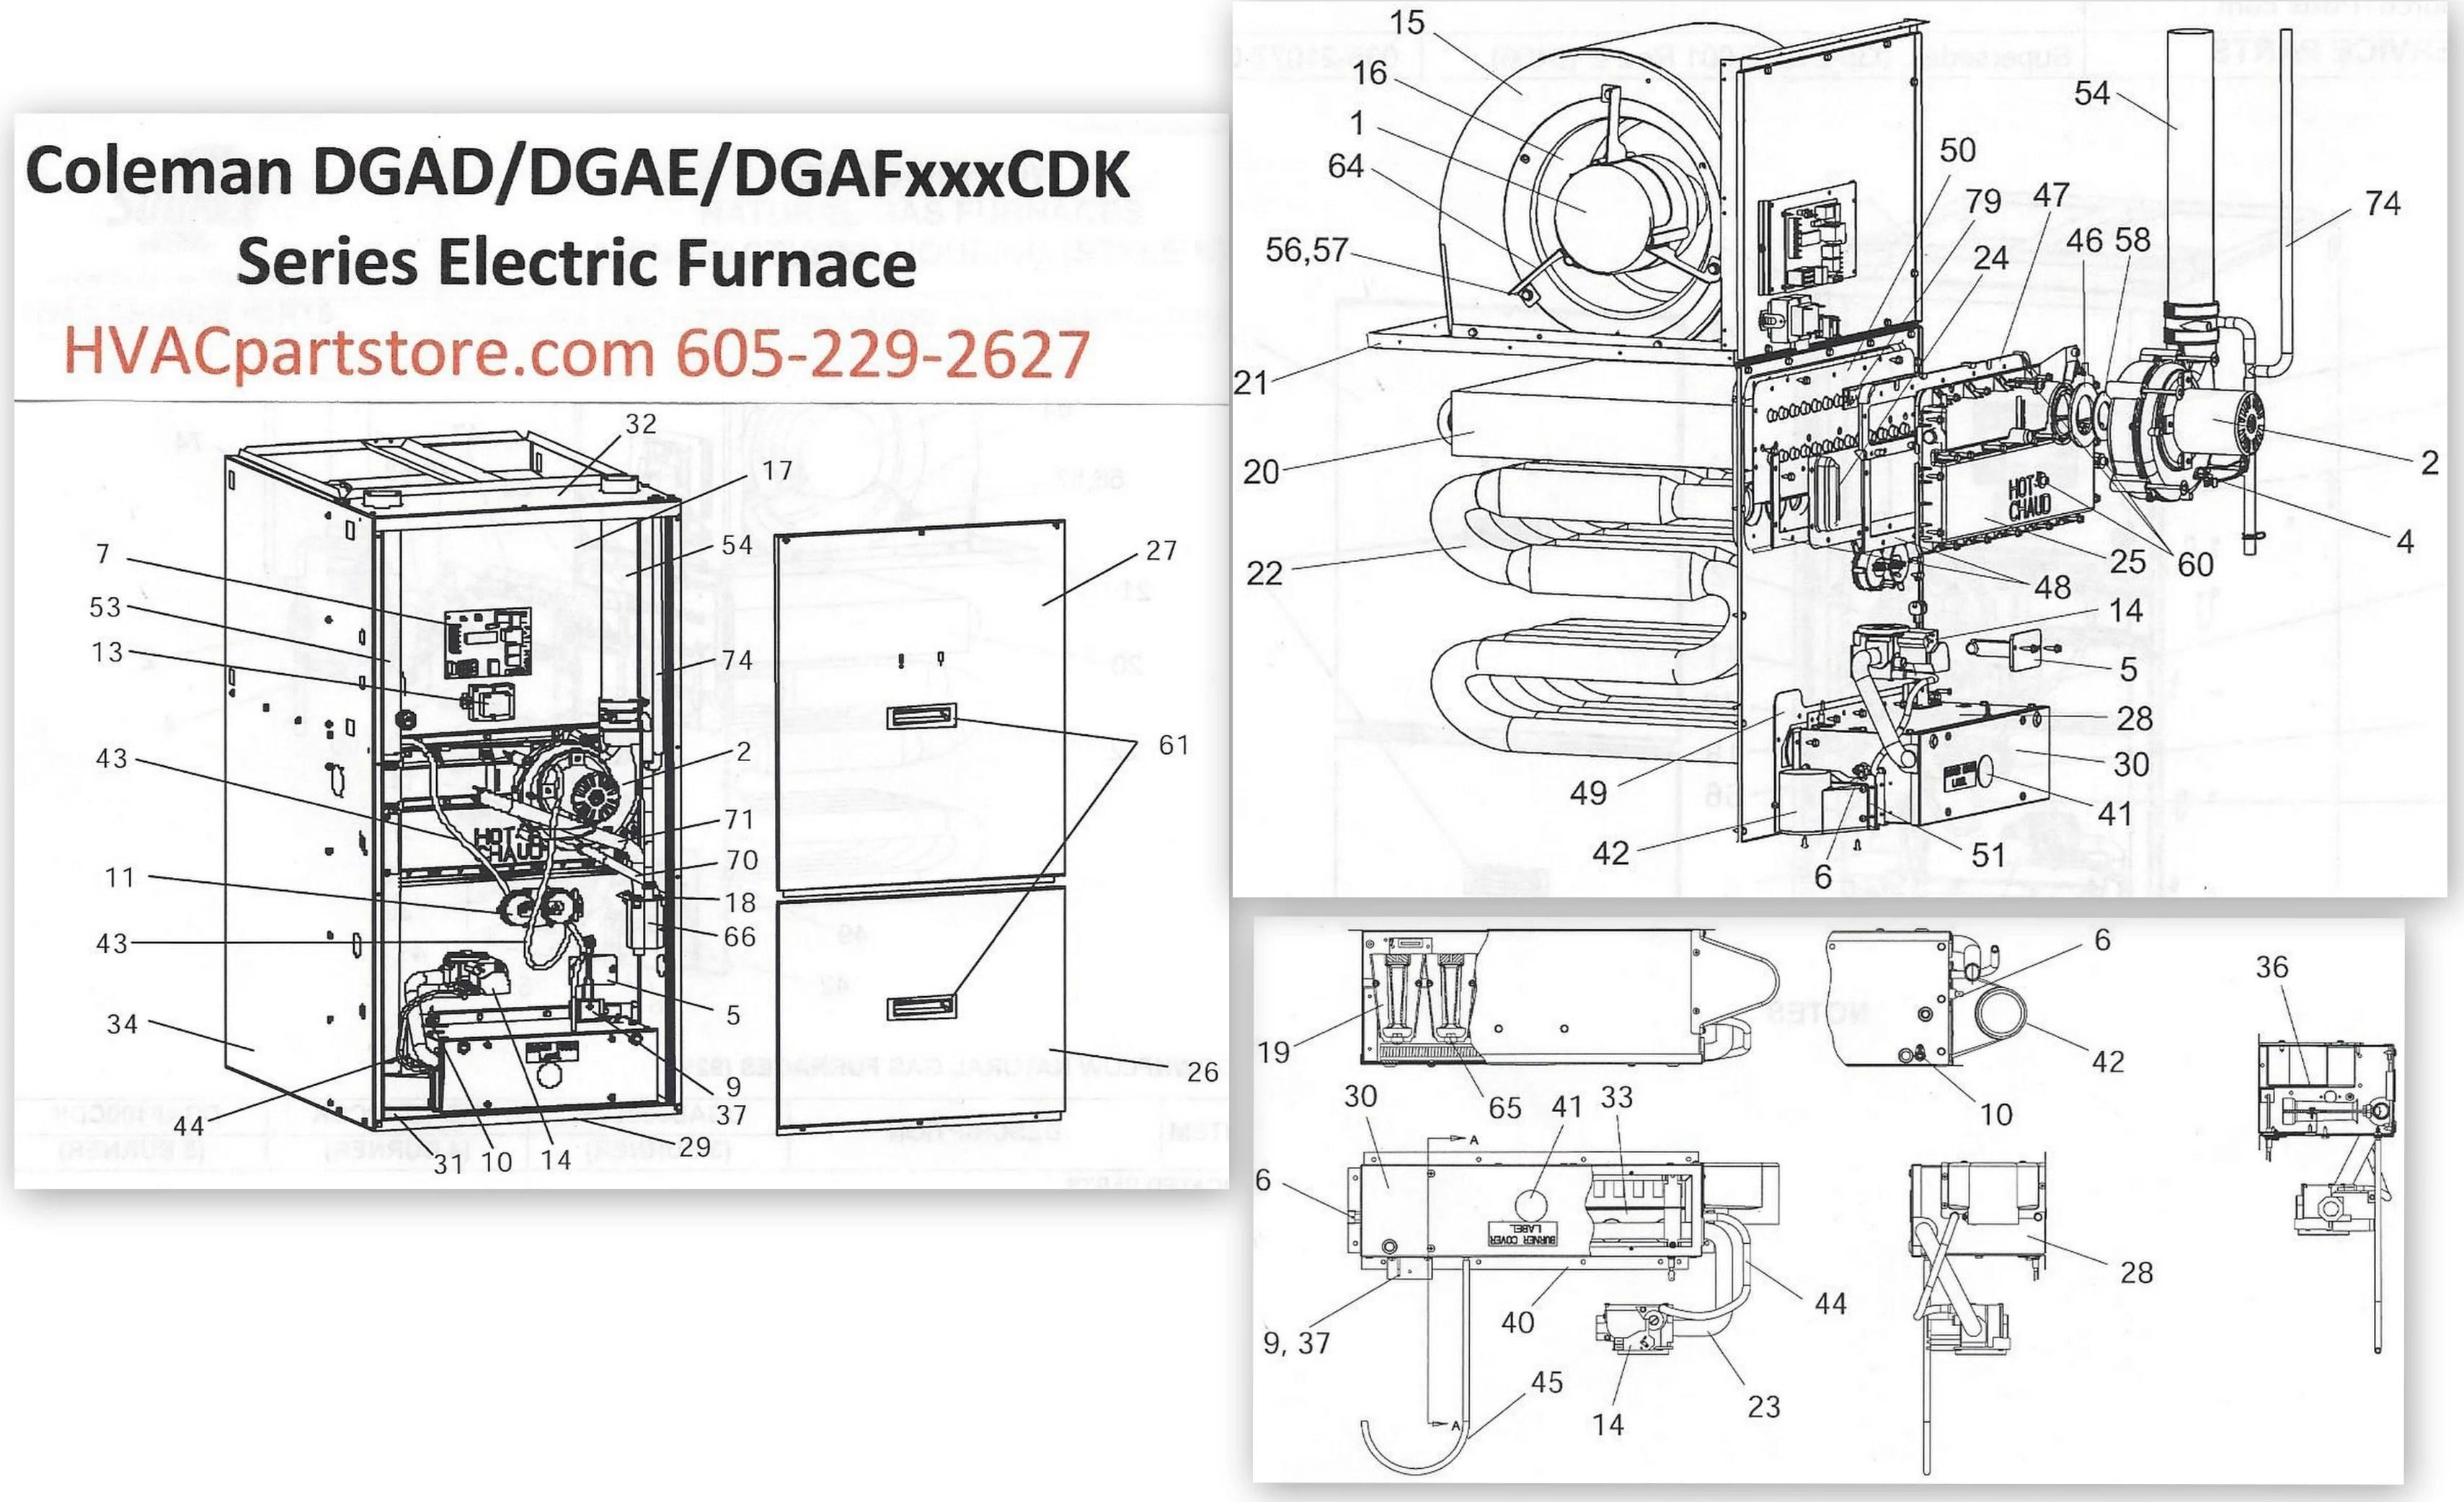 coleman evcon wiring diagram thermostat 50 amp gfci breaker dgaf100cdk gas furnace parts  hvacpartstore